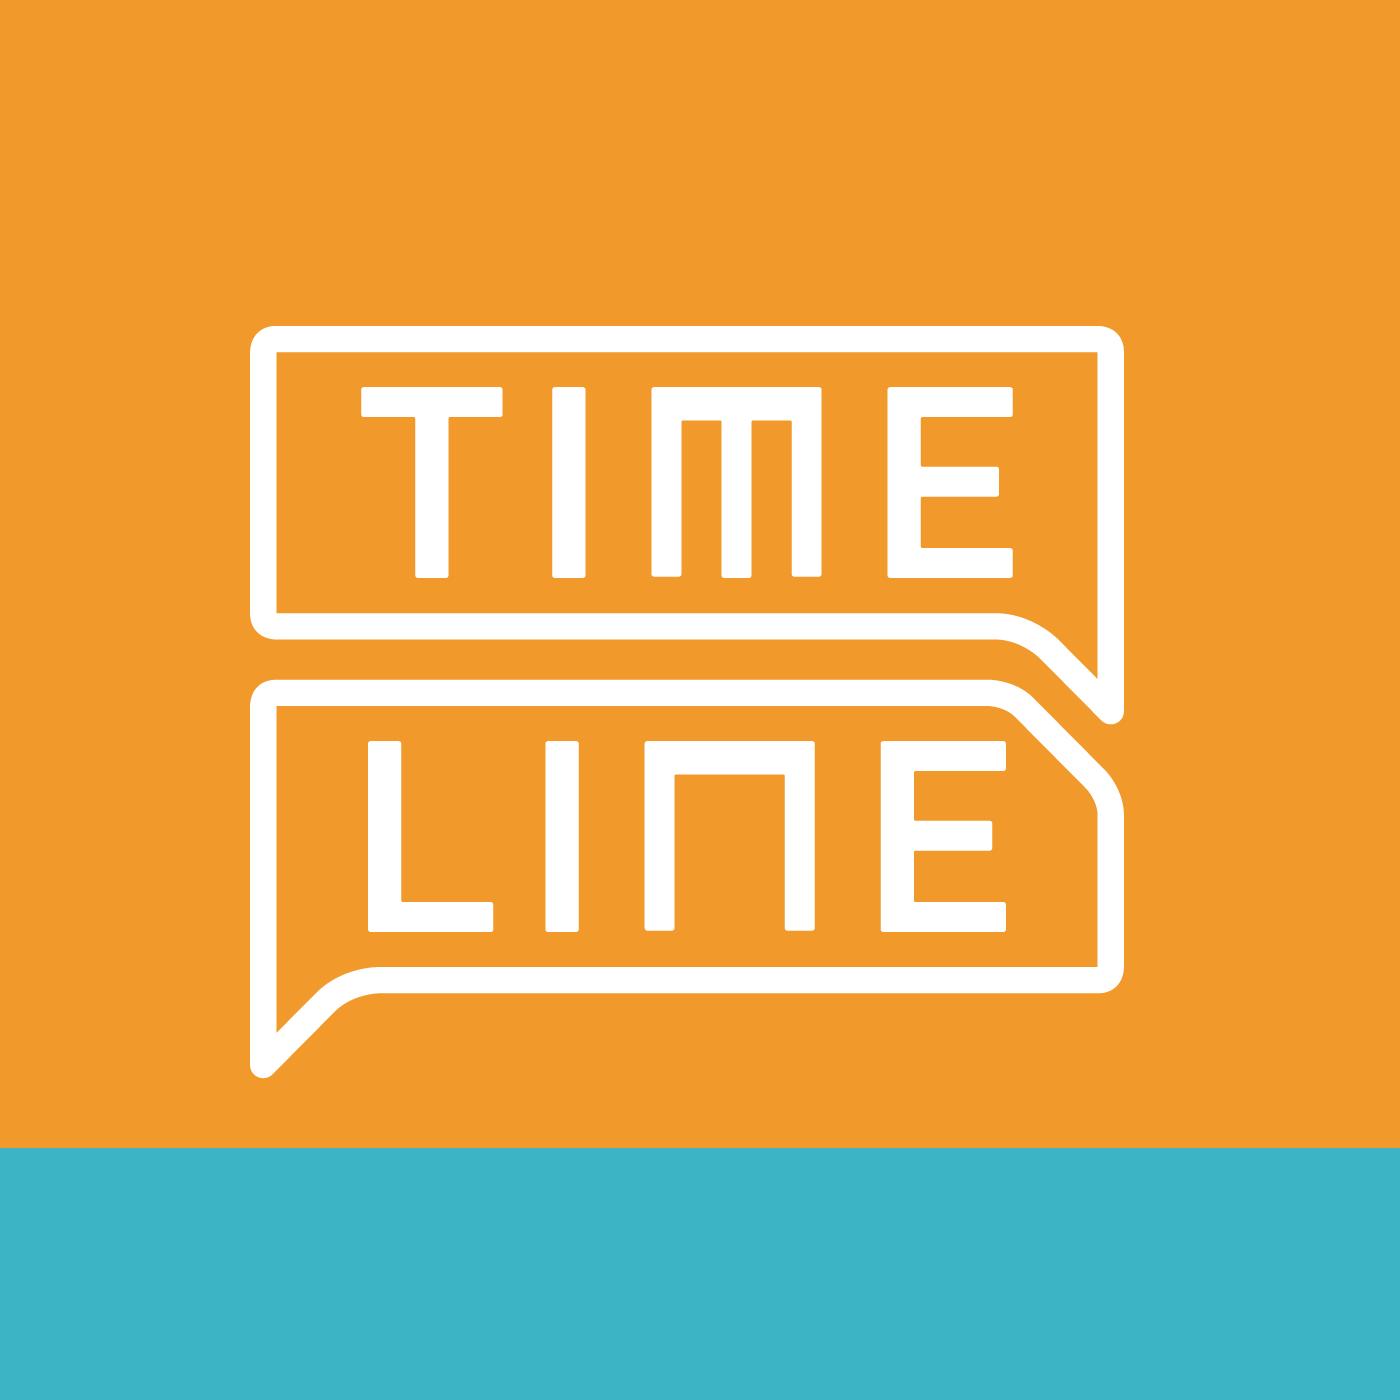 Timeline Gaúcha 28/06/2017